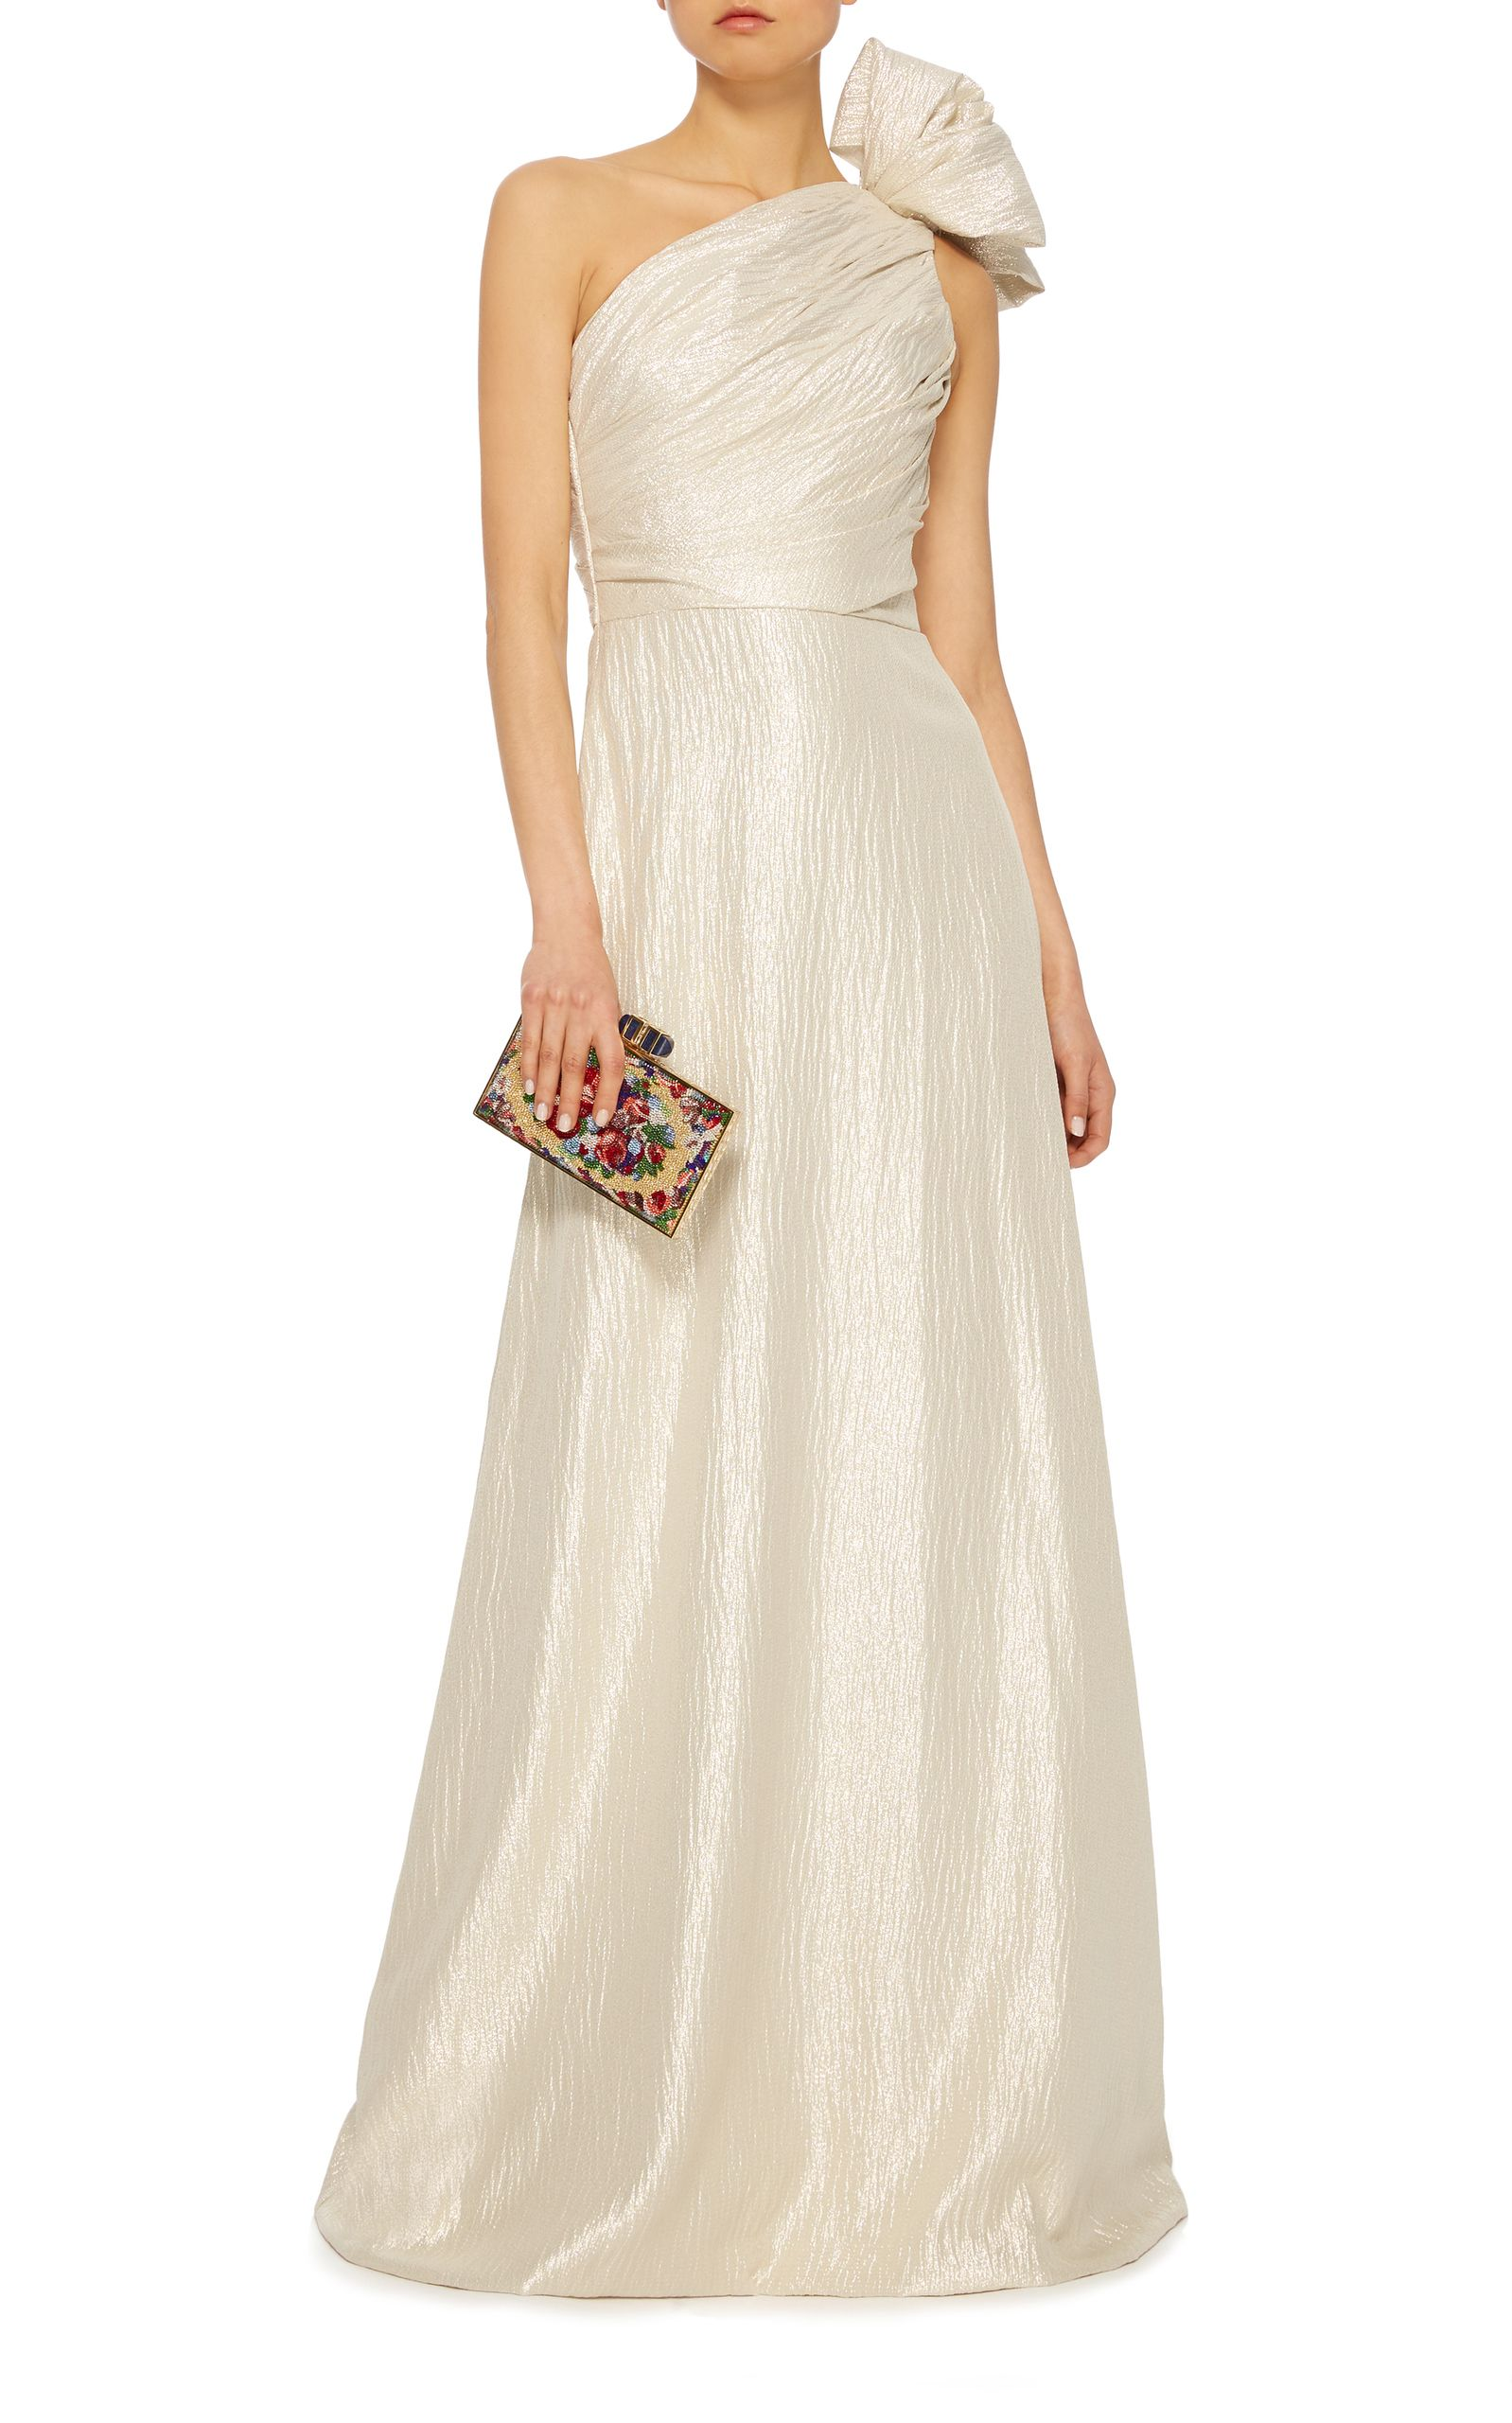 Wedding dress with bow on back  Elizabeth Kennedy OneShoulder Gown with Bow u Back Train